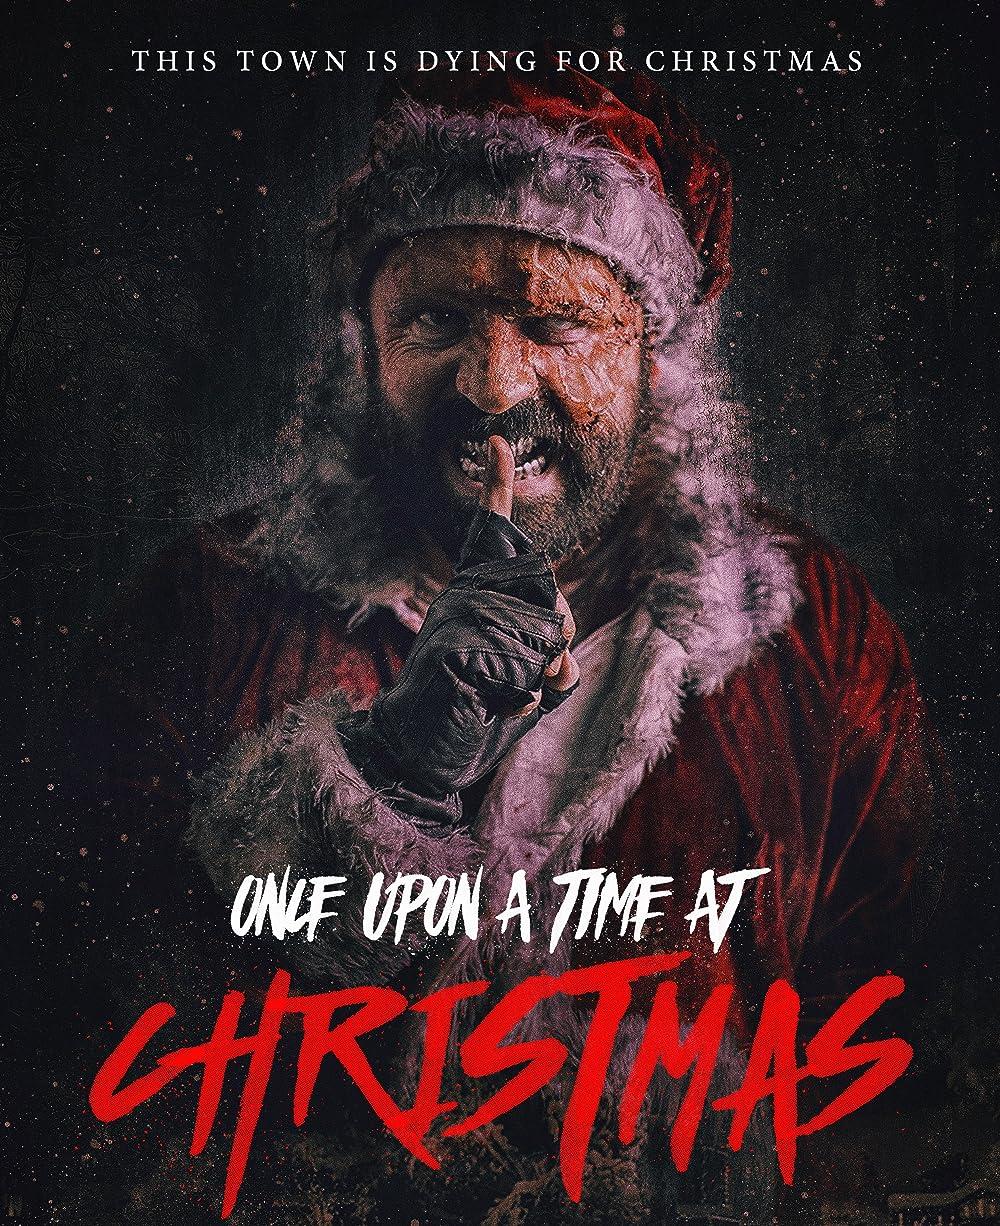 Once Upon a Time at Christmas 2017